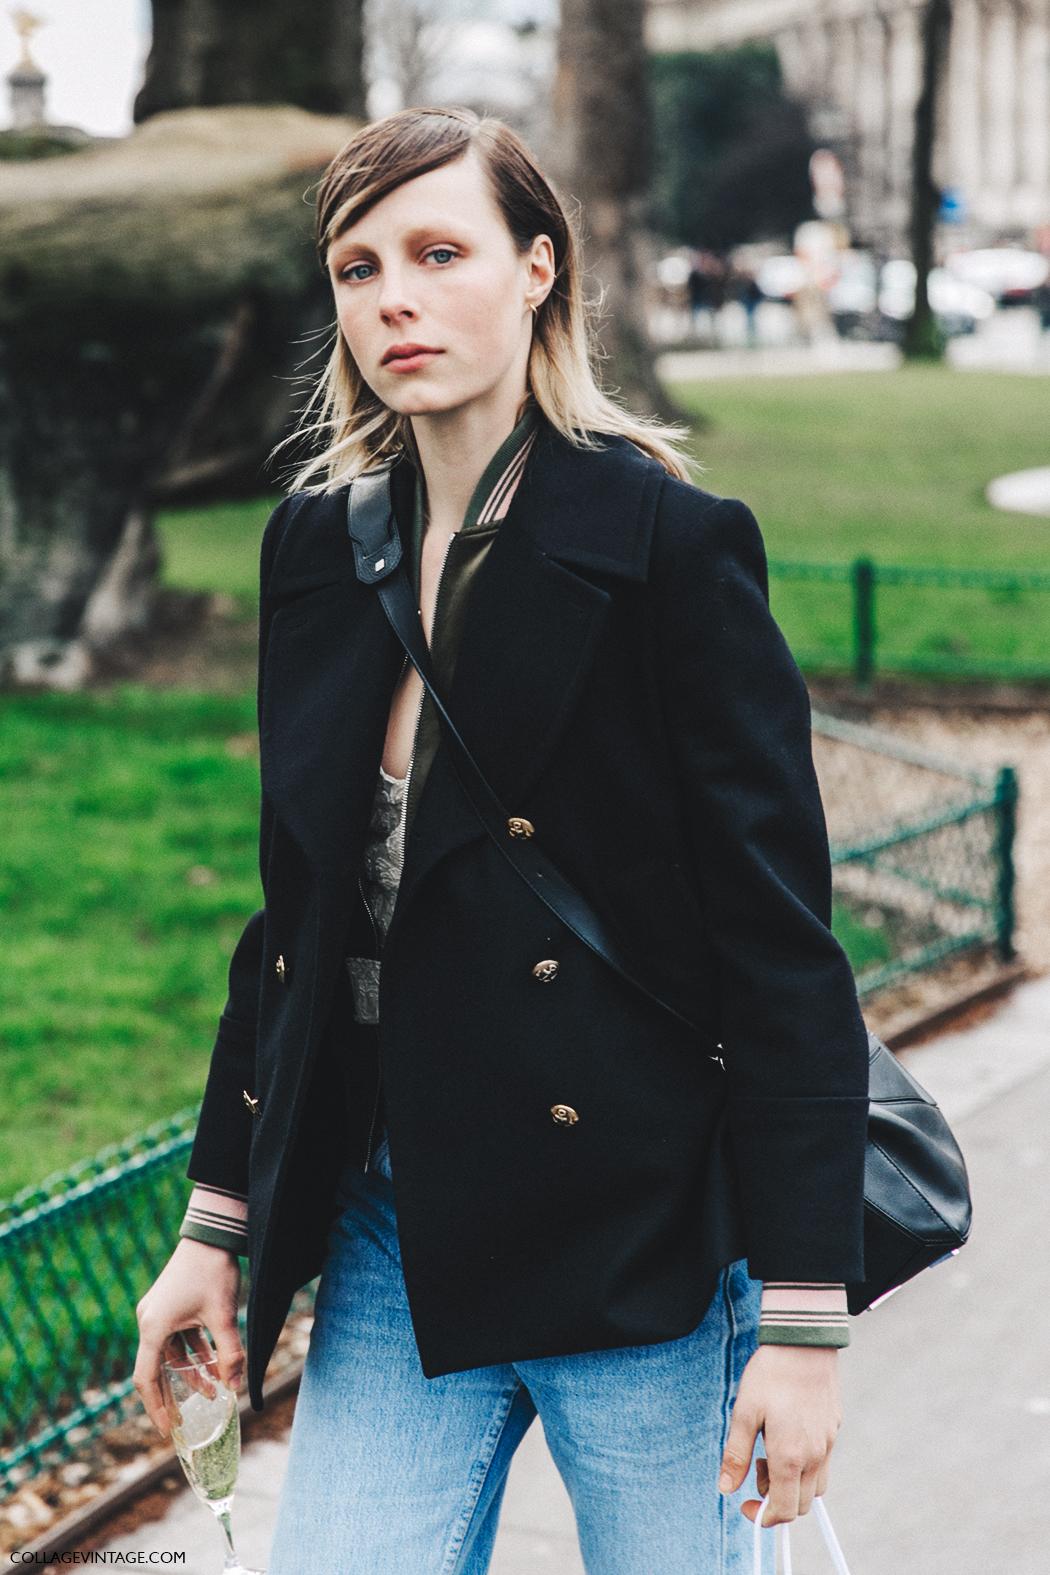 PFW-Paris_Fashion_Week_Fall_2016-Street_Style-Collage_Vintage-Edie_Campbell-1